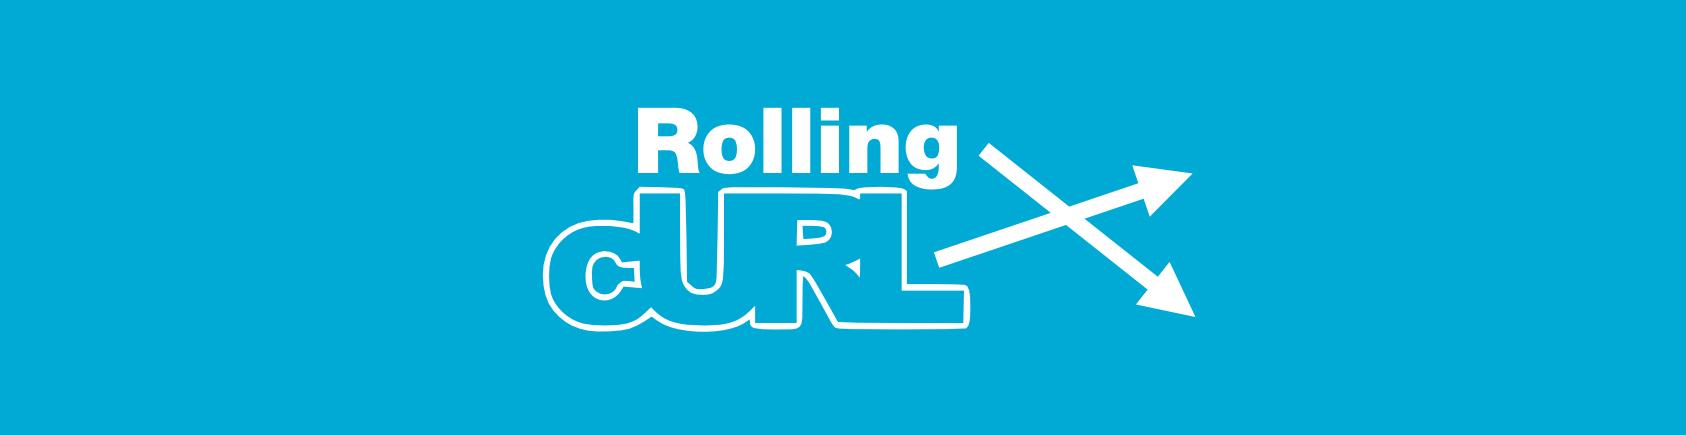 RollingCurlX/README md at master · marcushat/RollingCurlX · GitHub